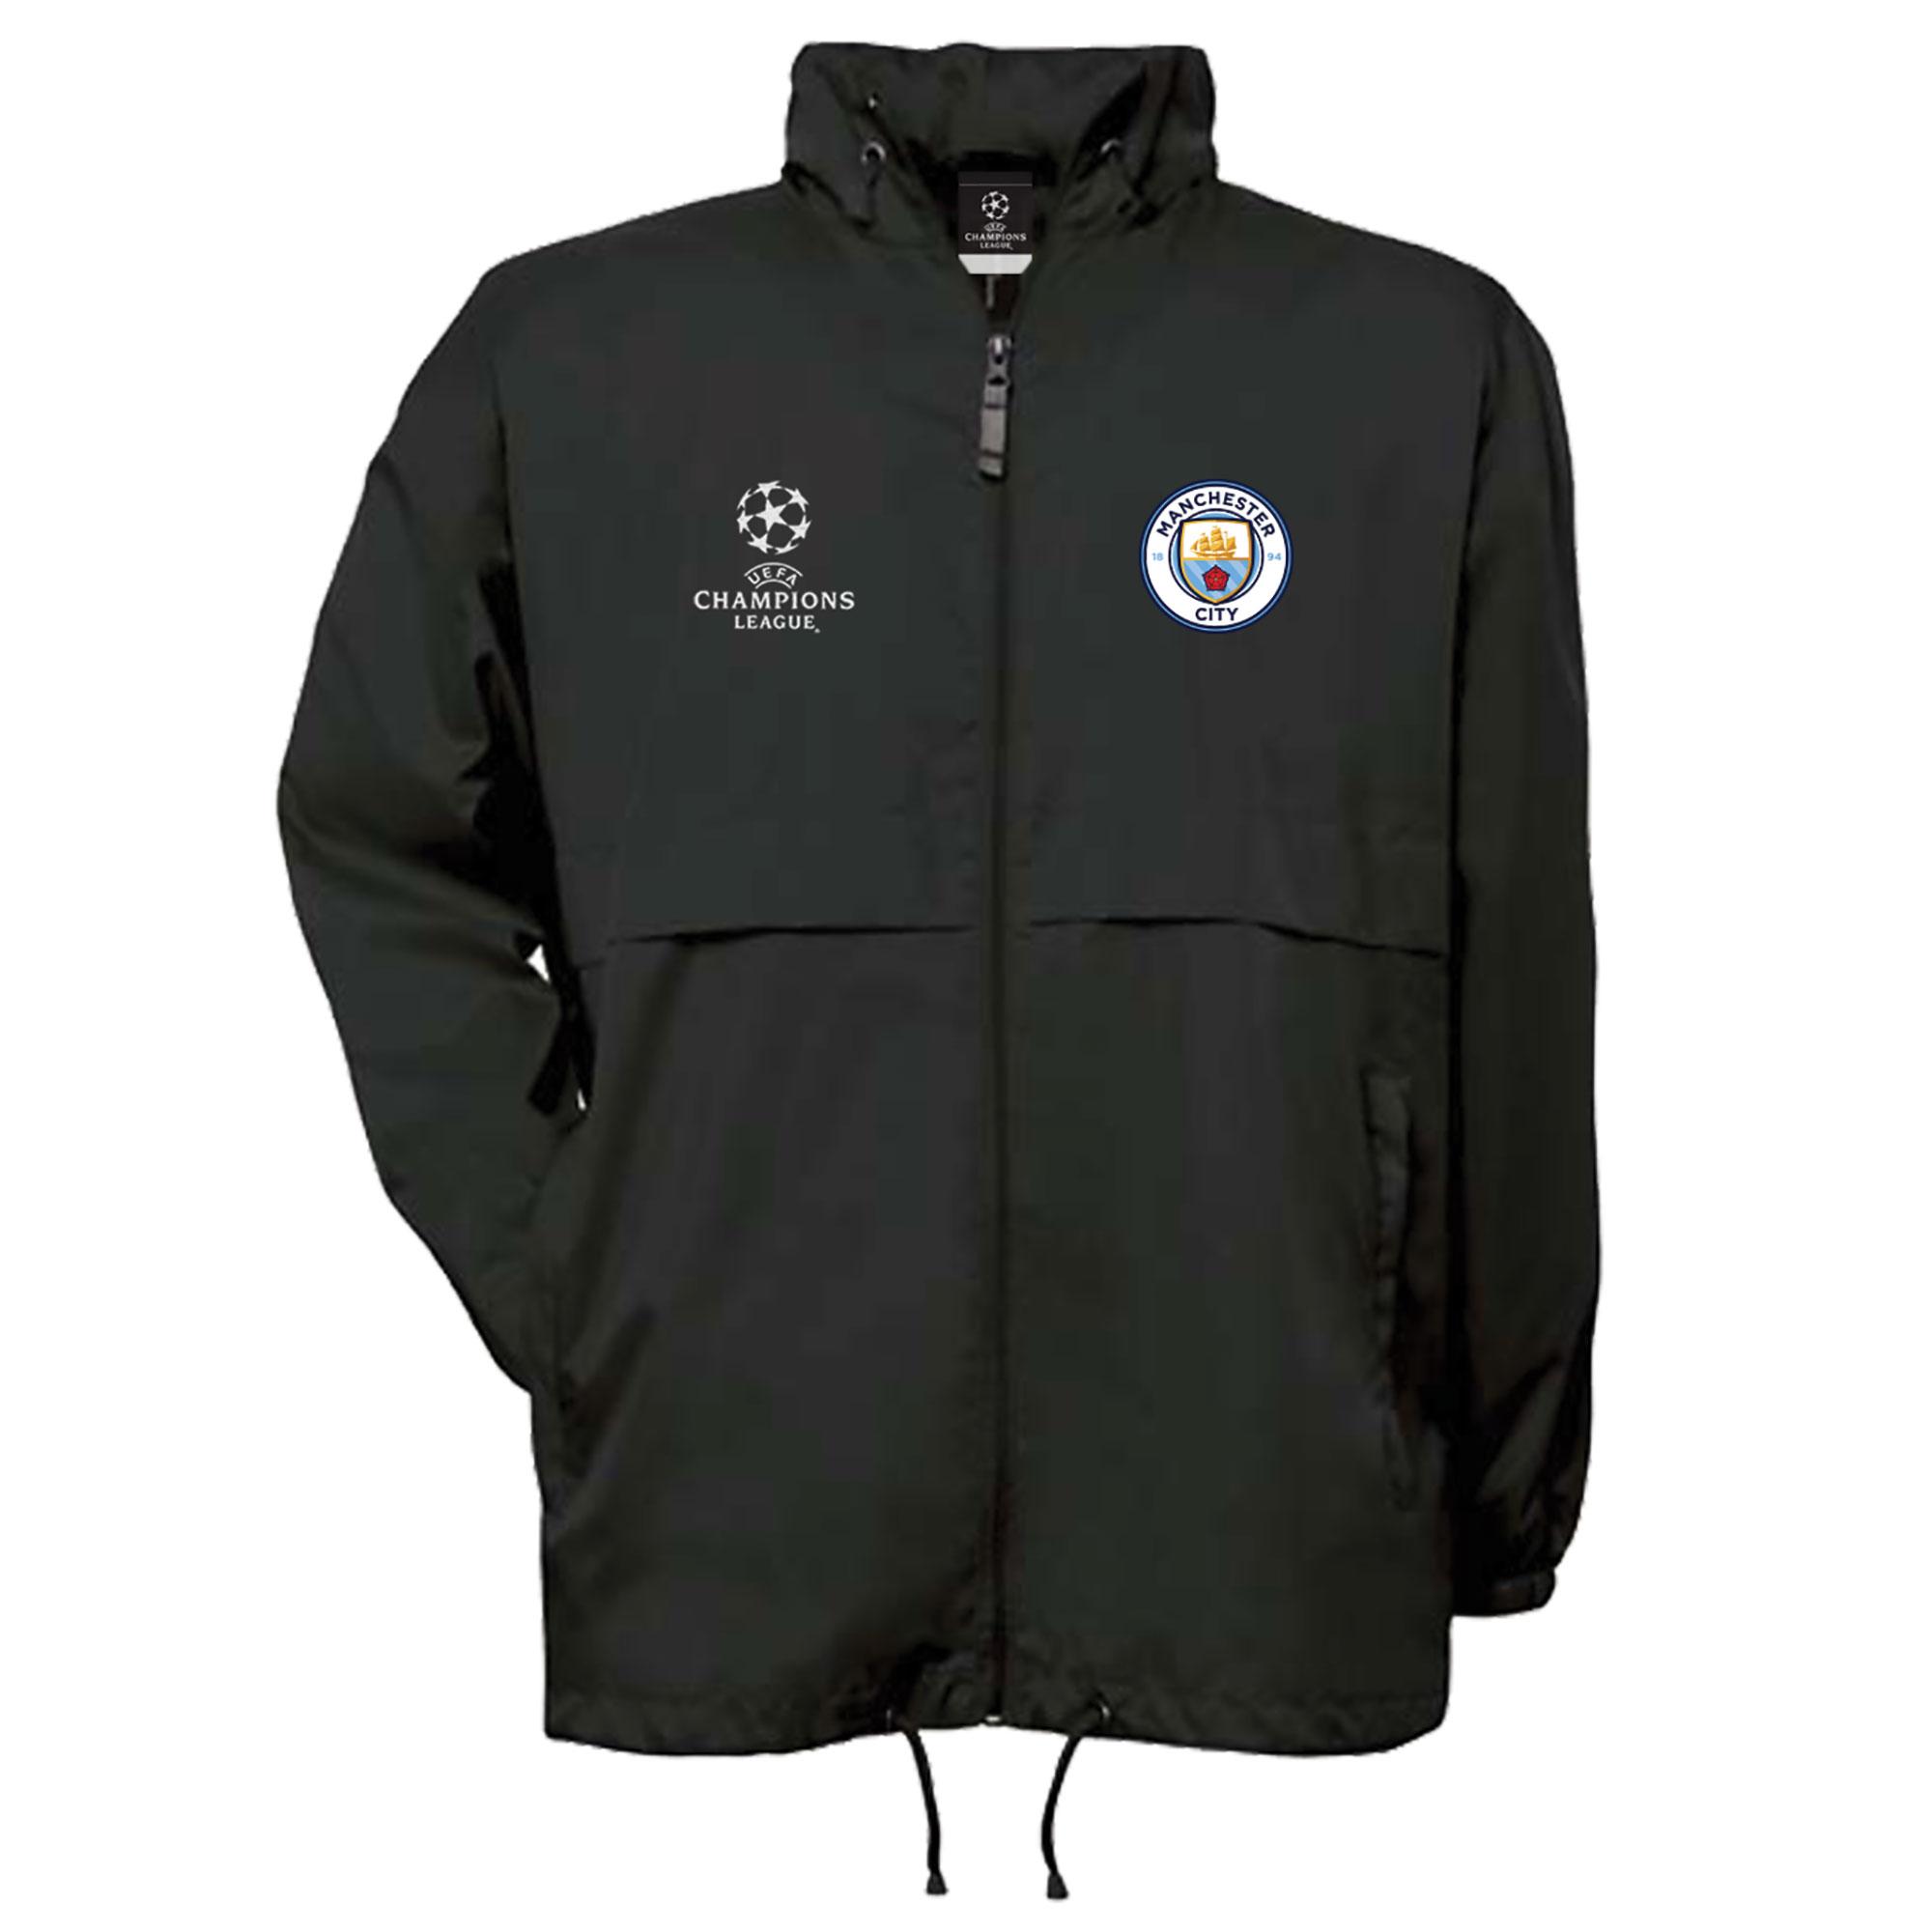 Manchester City UEFA Champions League Windbreaker Jacket - Black - Men